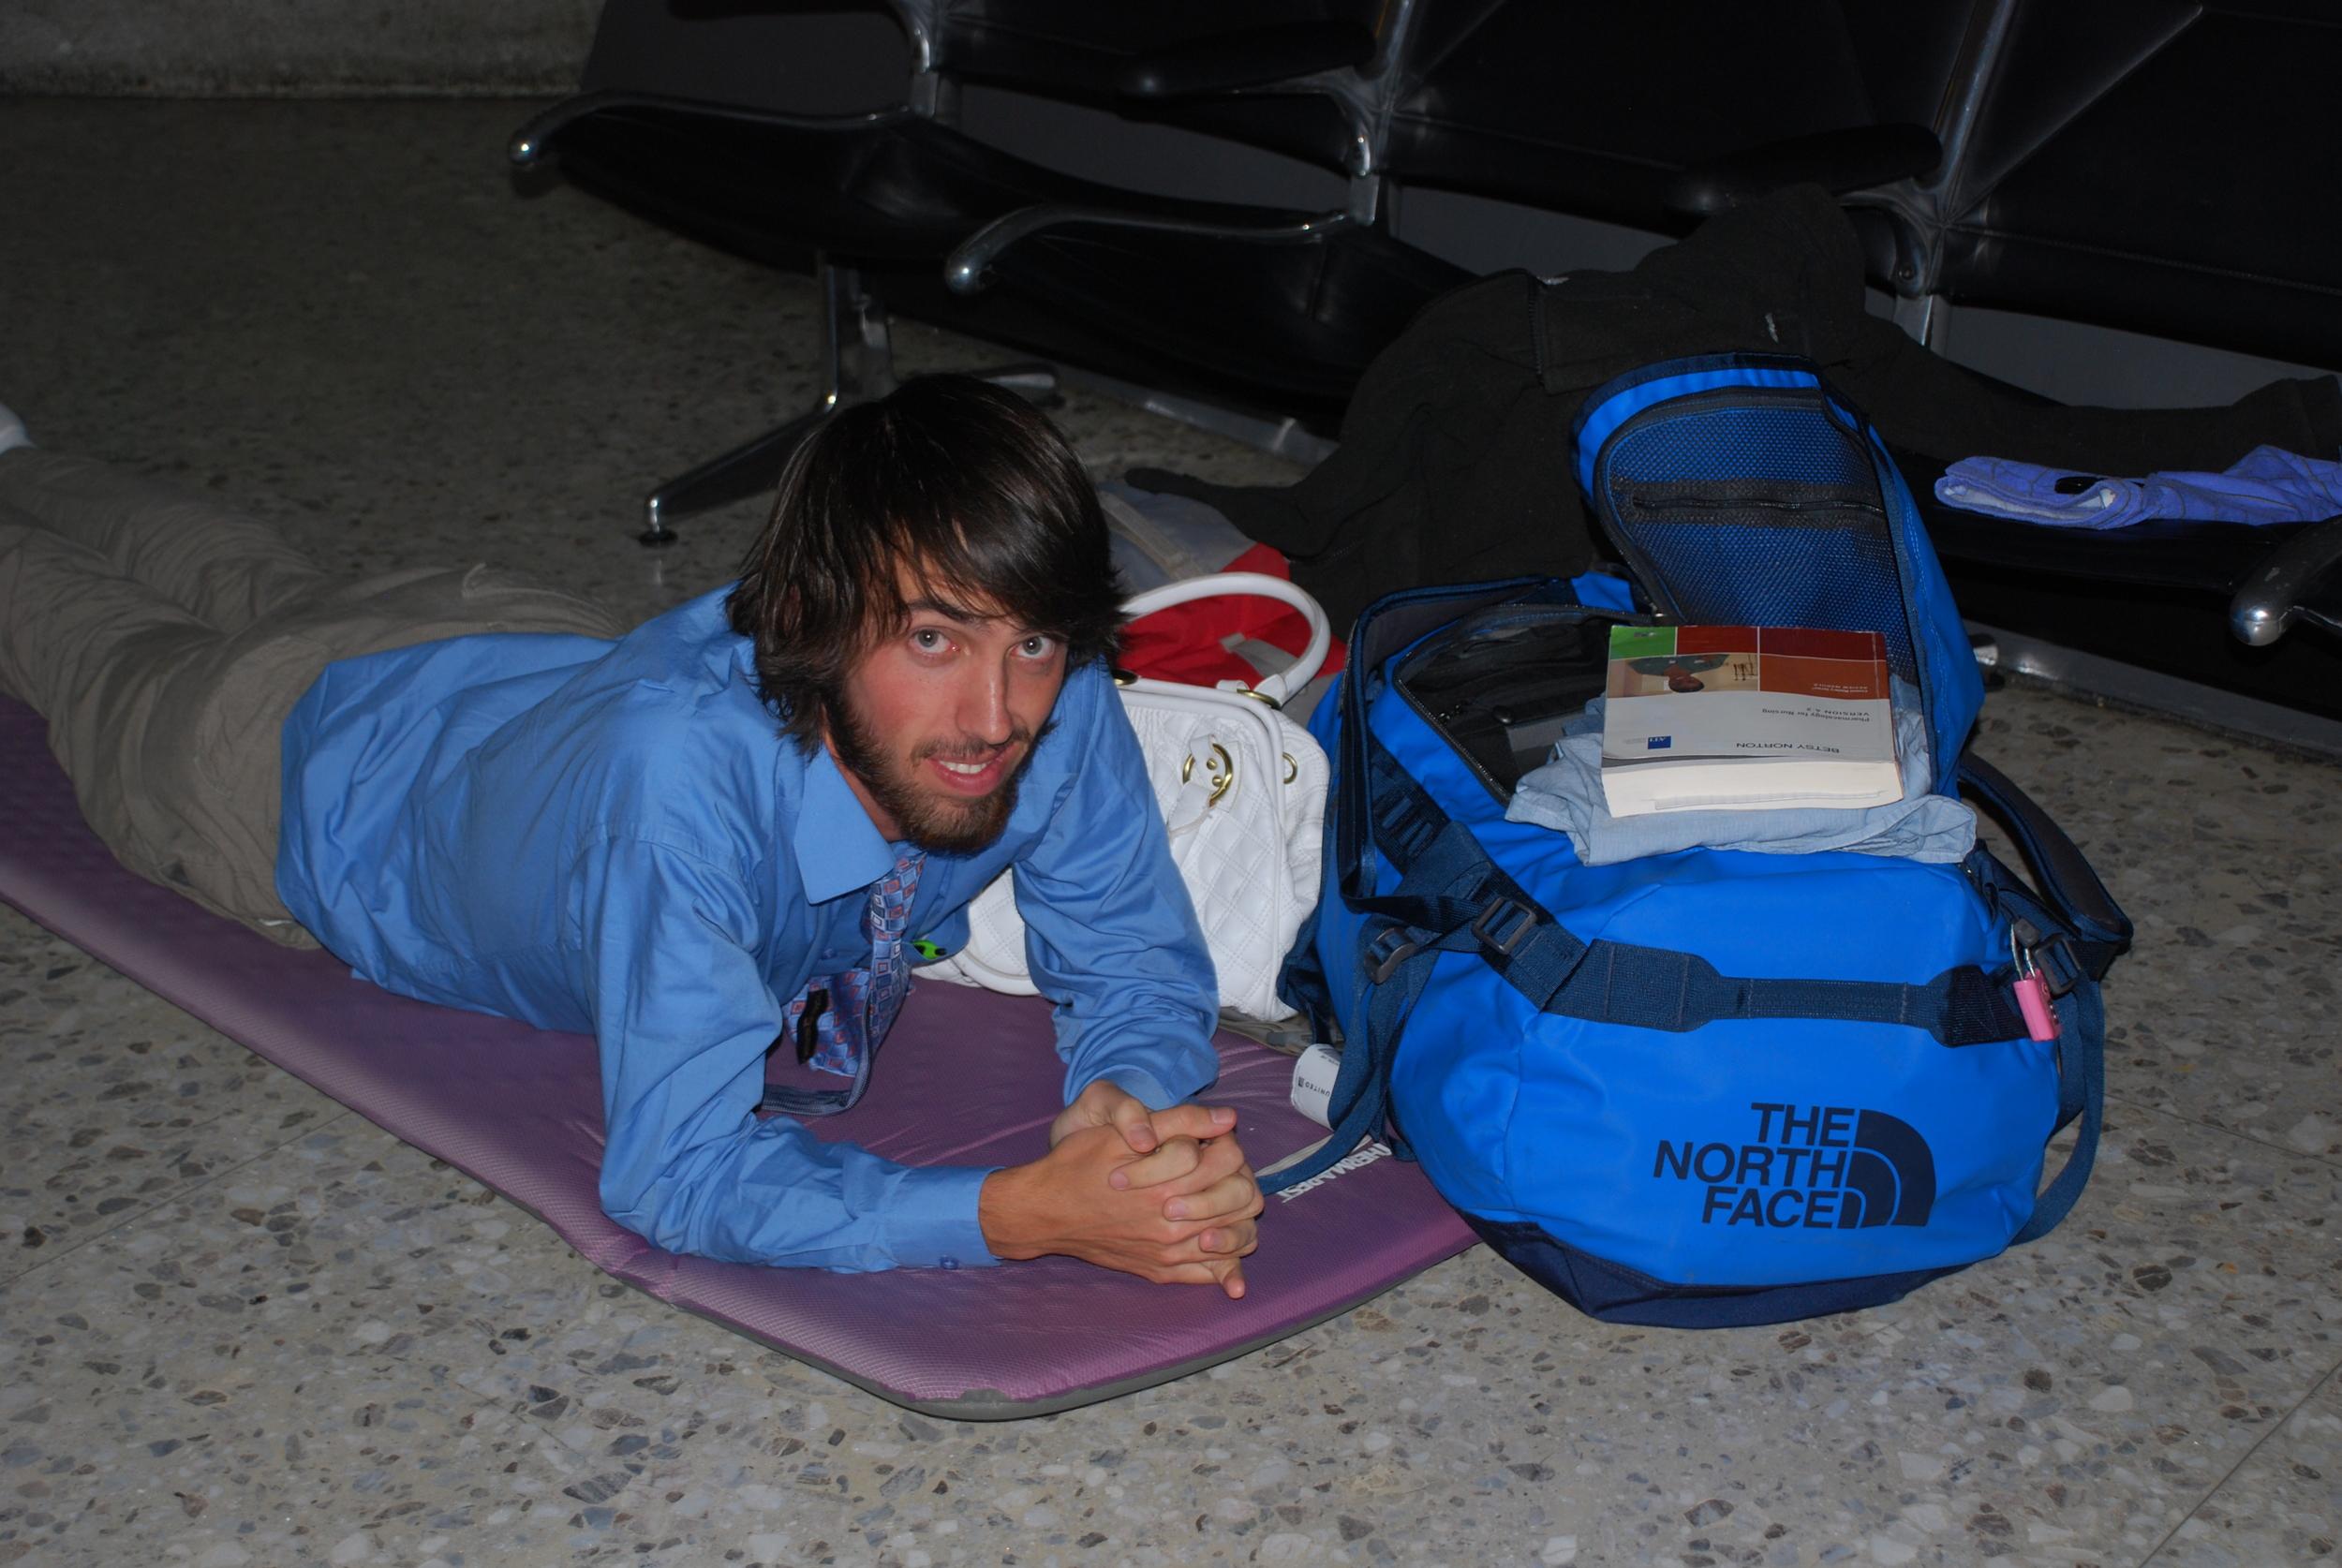 Sleeping on the floor of Dulles International Airport en-route to Africa